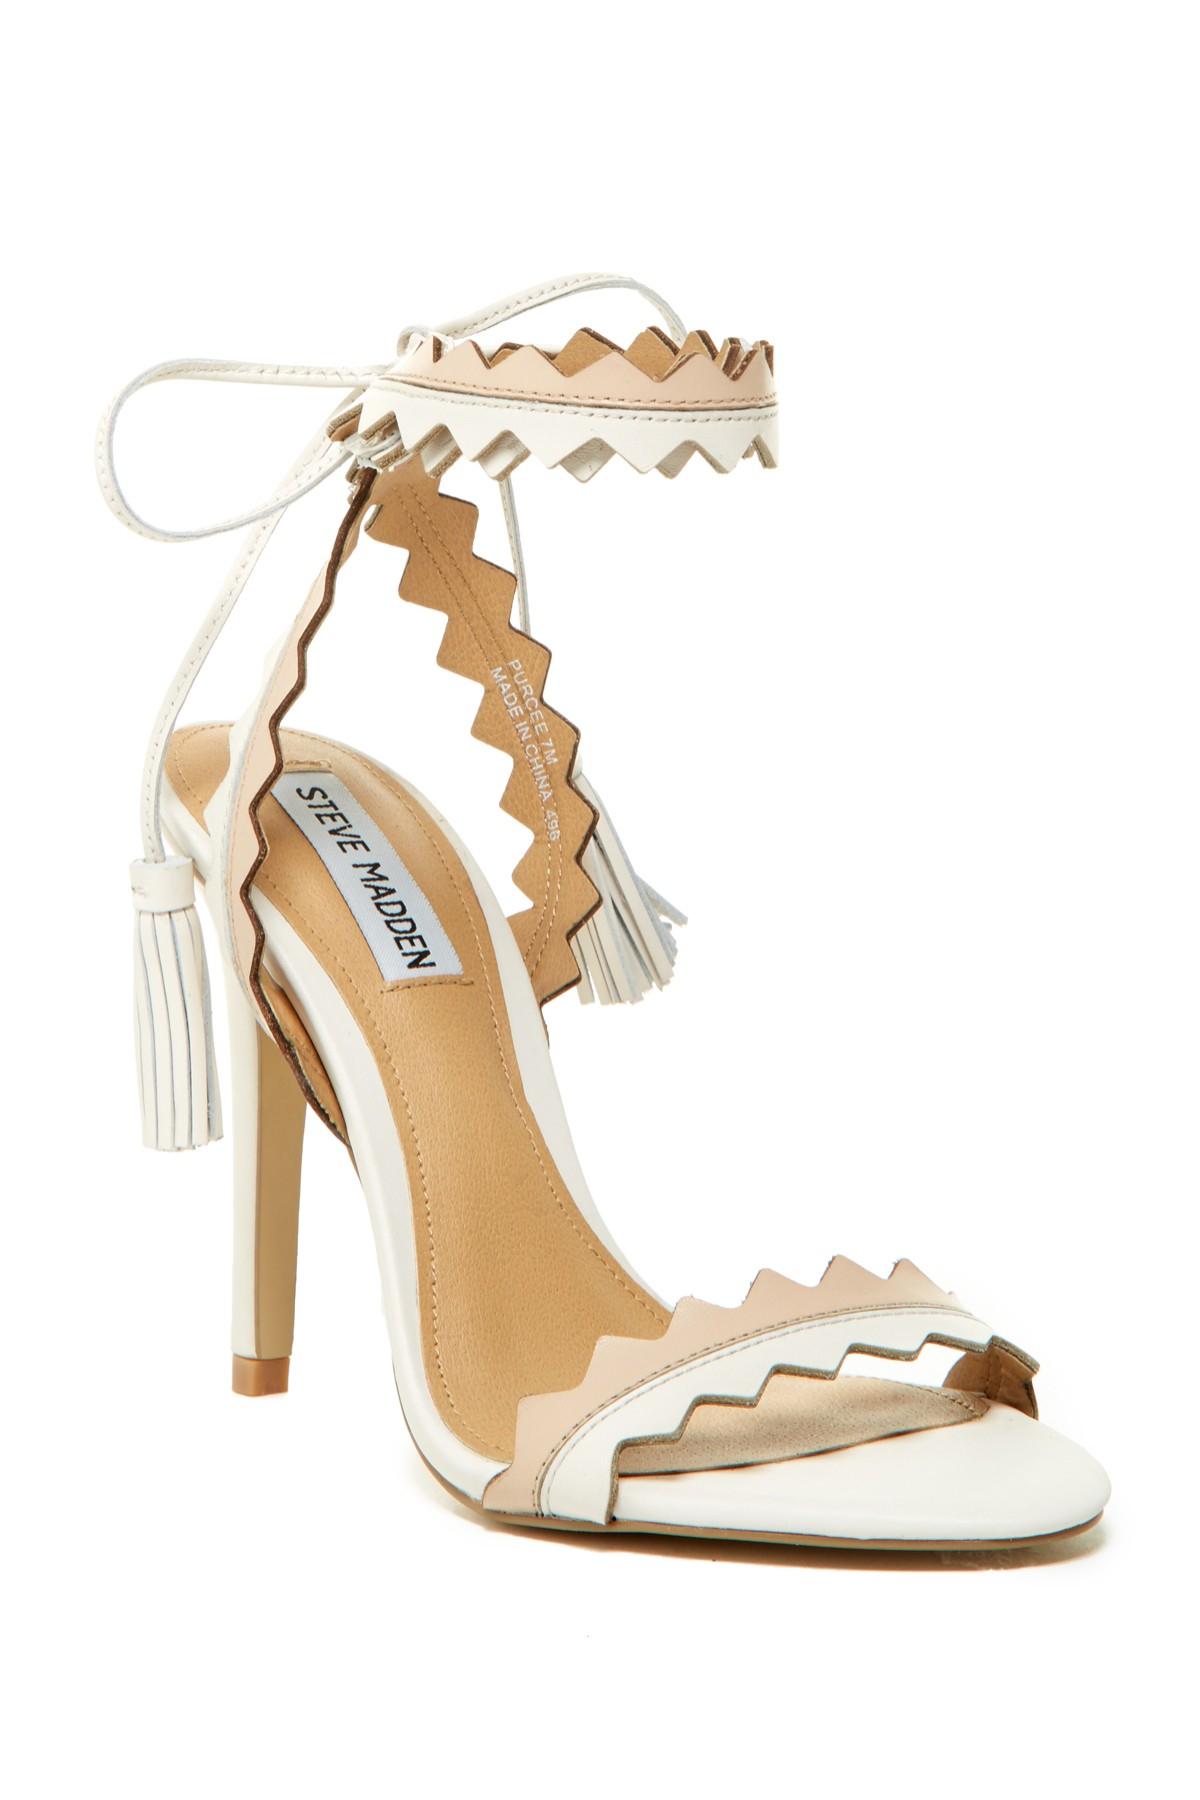 4c76355d300 Lyst - Steve Madden Purcee Heel Sandal in Natural